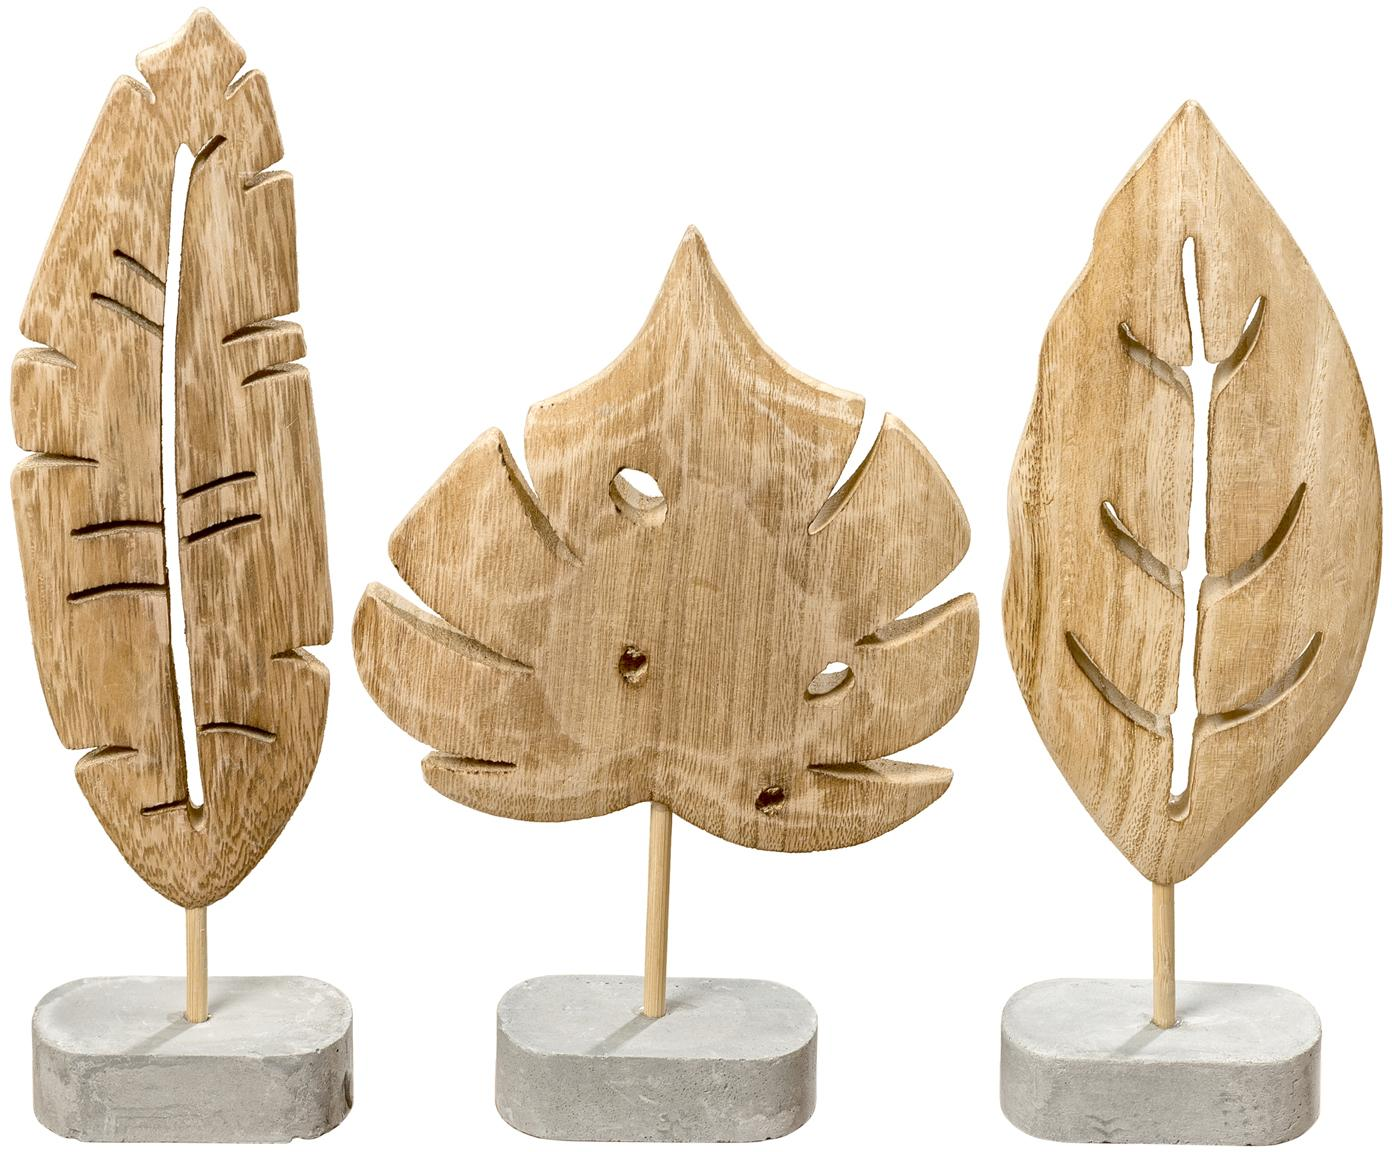 Deko-Objekt-Set Blatt, 3-tlg., Sockel: Beton, Sockel: GrauDeko-Objekt: Paulowniaholz, Verschiedene Grössen